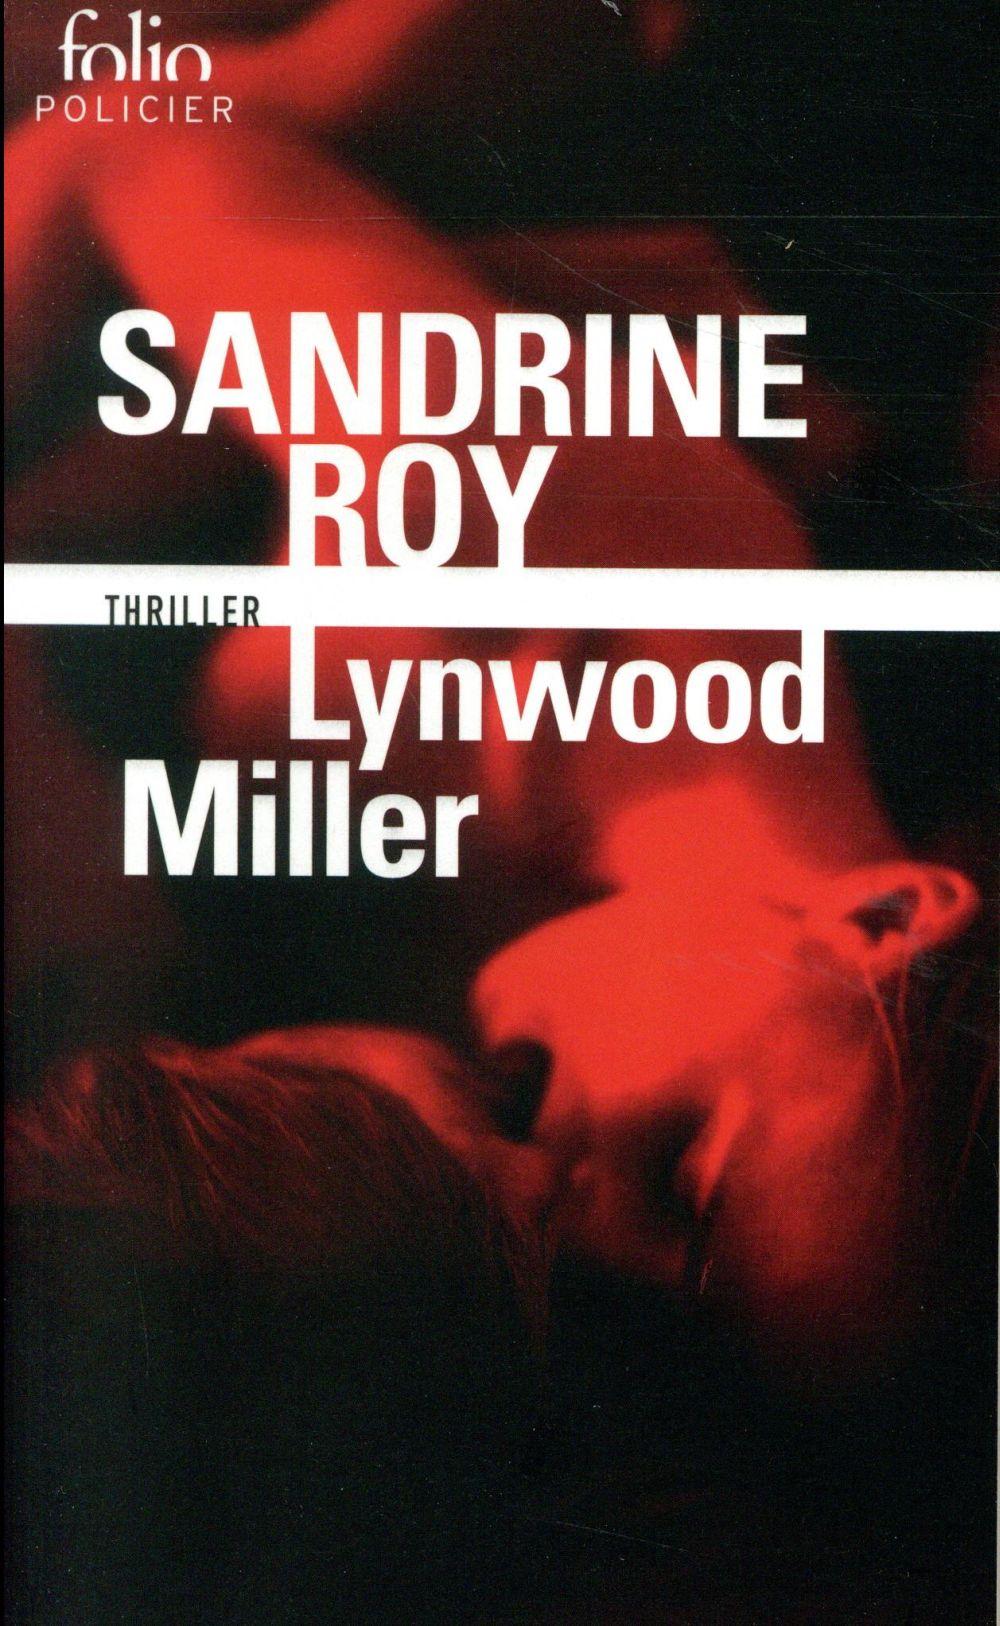 LYNWOOD MILLER ROY SANDRINE GALLIMARD